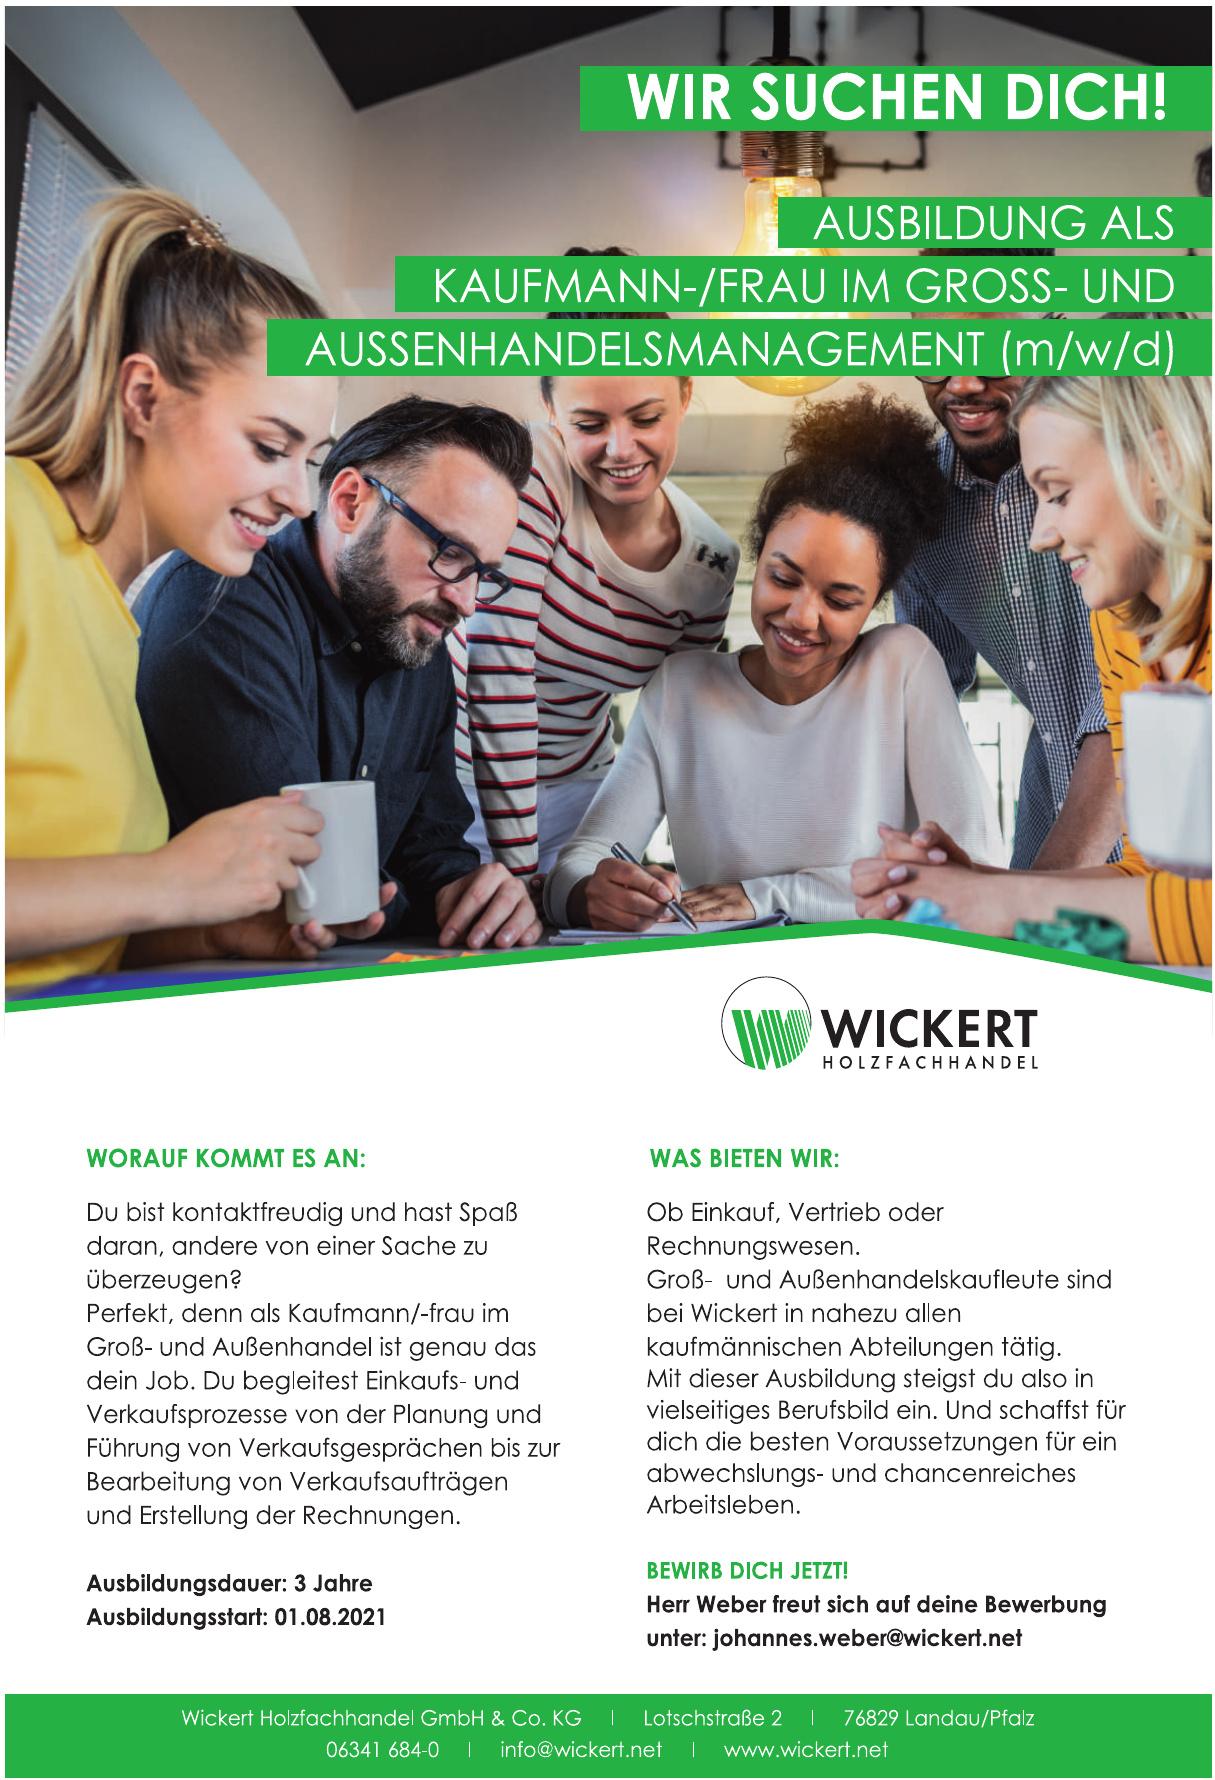 Wickert Holzhandel GmbH & Co. KG